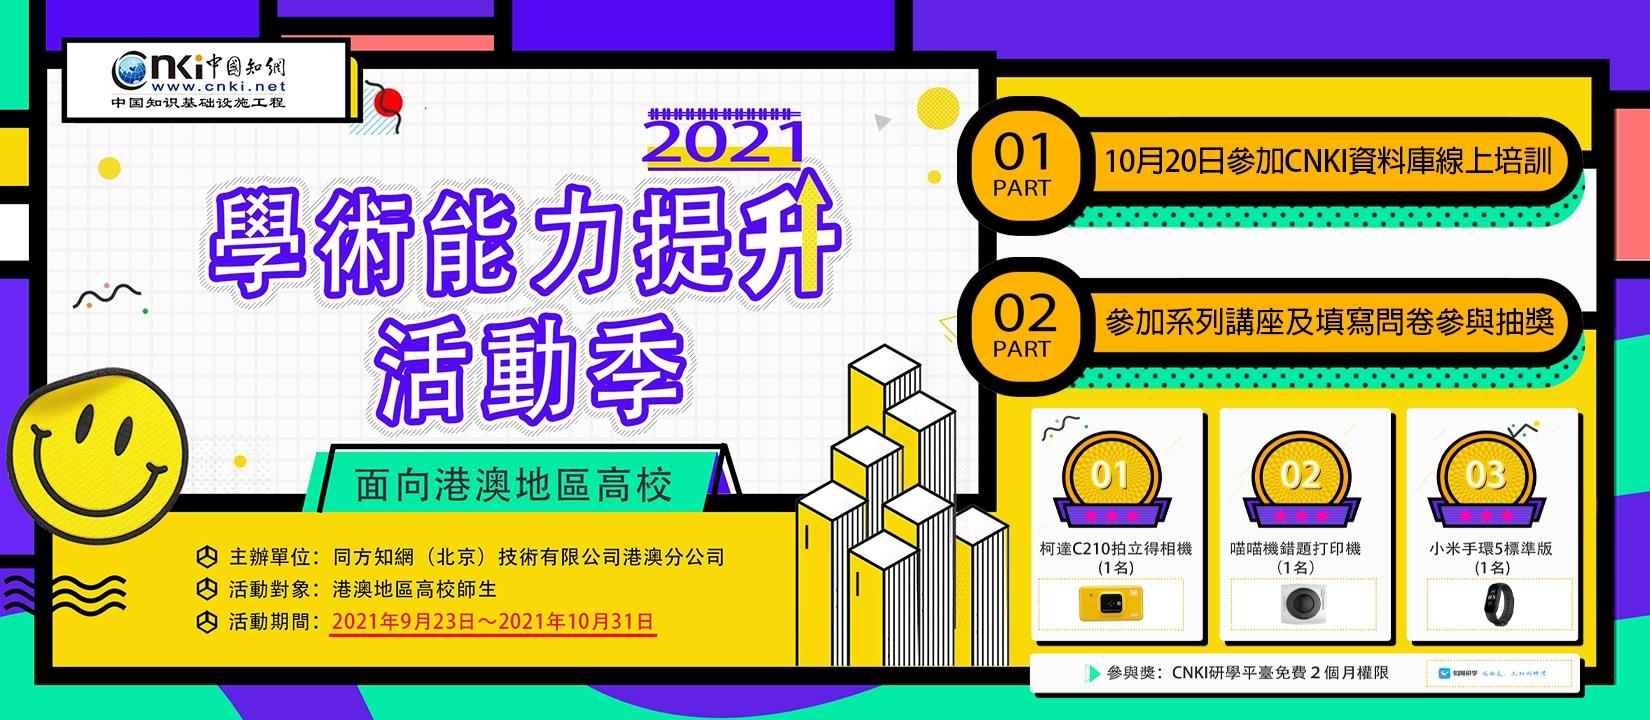 CNKI 中國知網:學術能力提升活動季2021